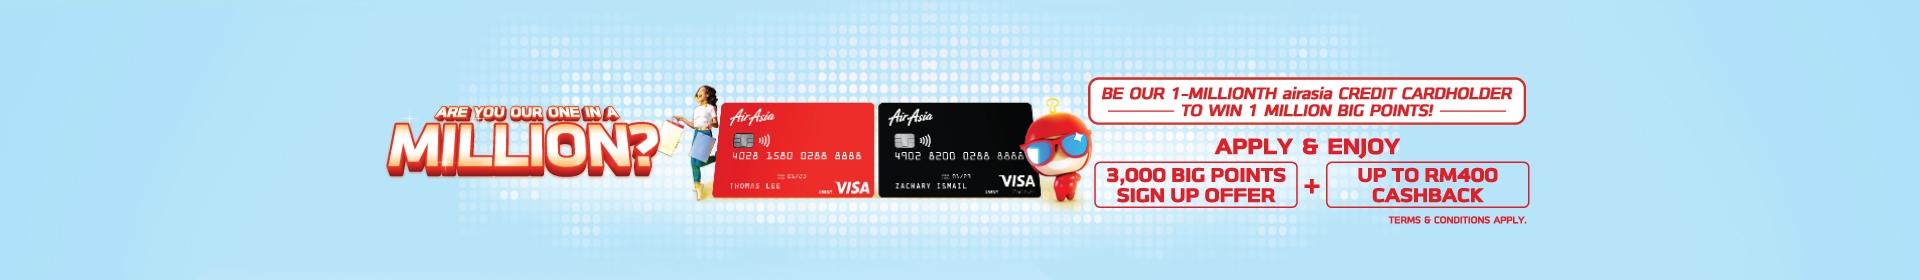 AirAsia Card - big rewards